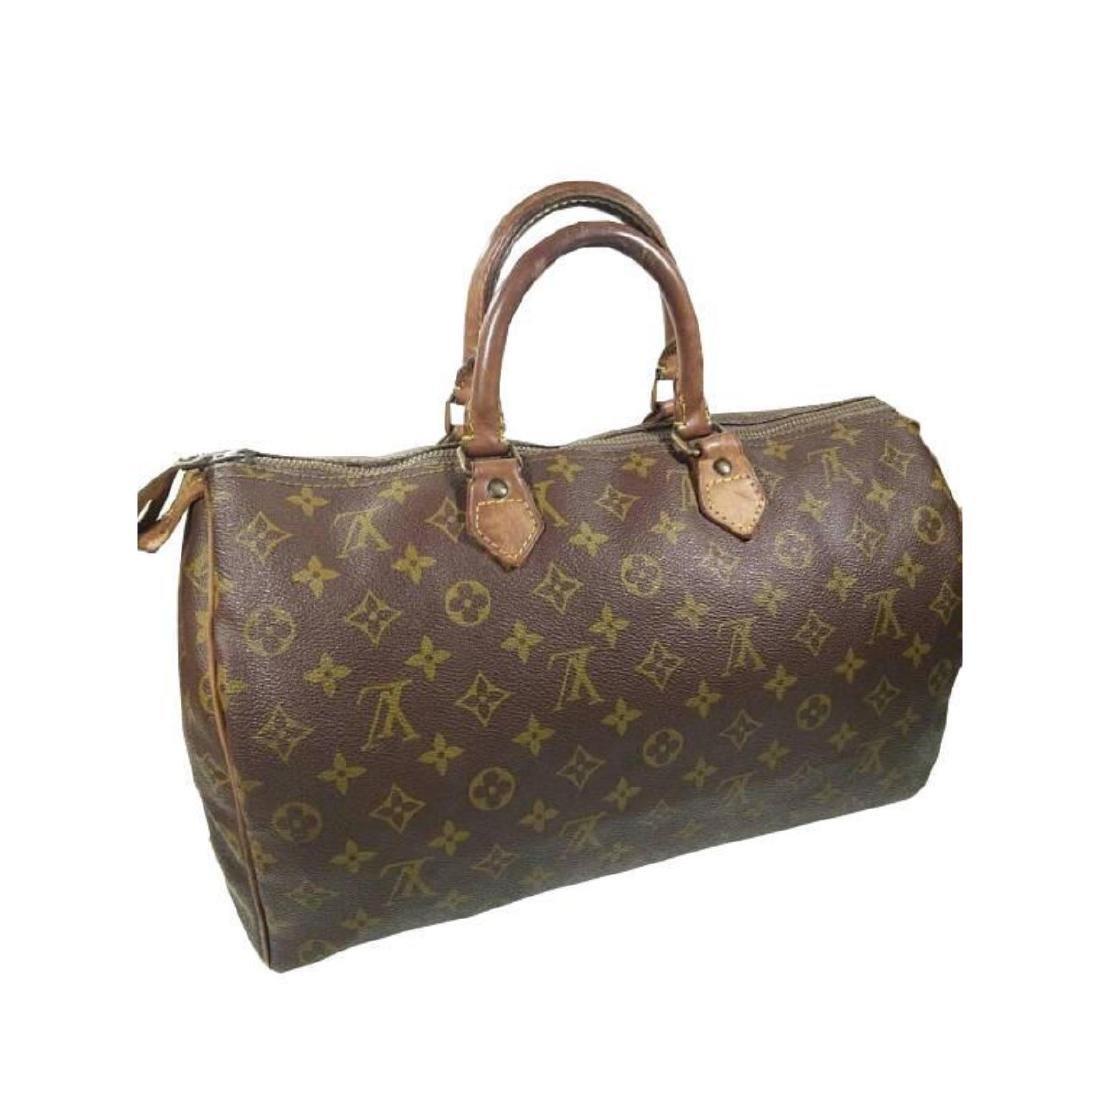 Auth Louis Vuitton Vintage Handbag Speedy 35 Monogram - 5